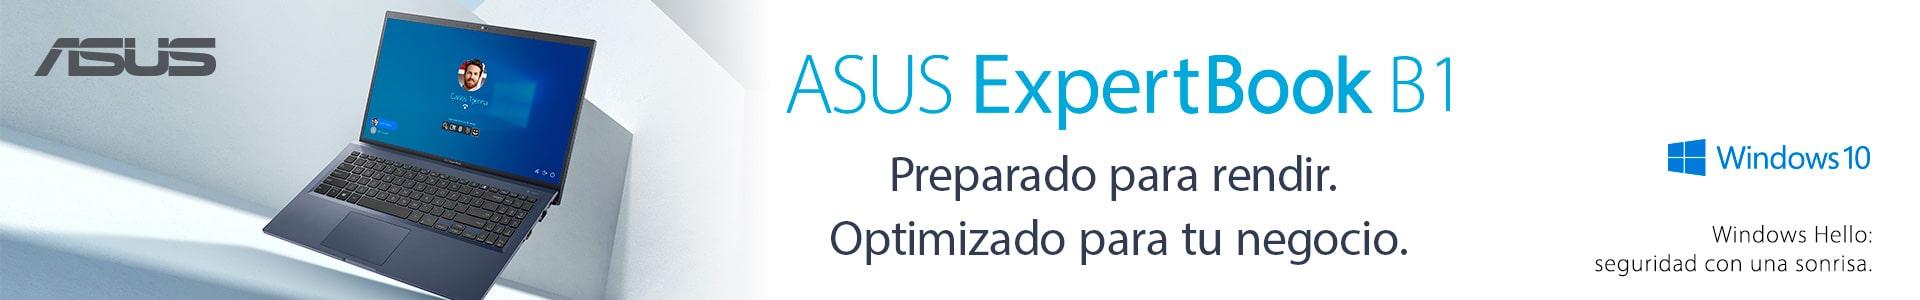 Portátiles Asus Expertbook